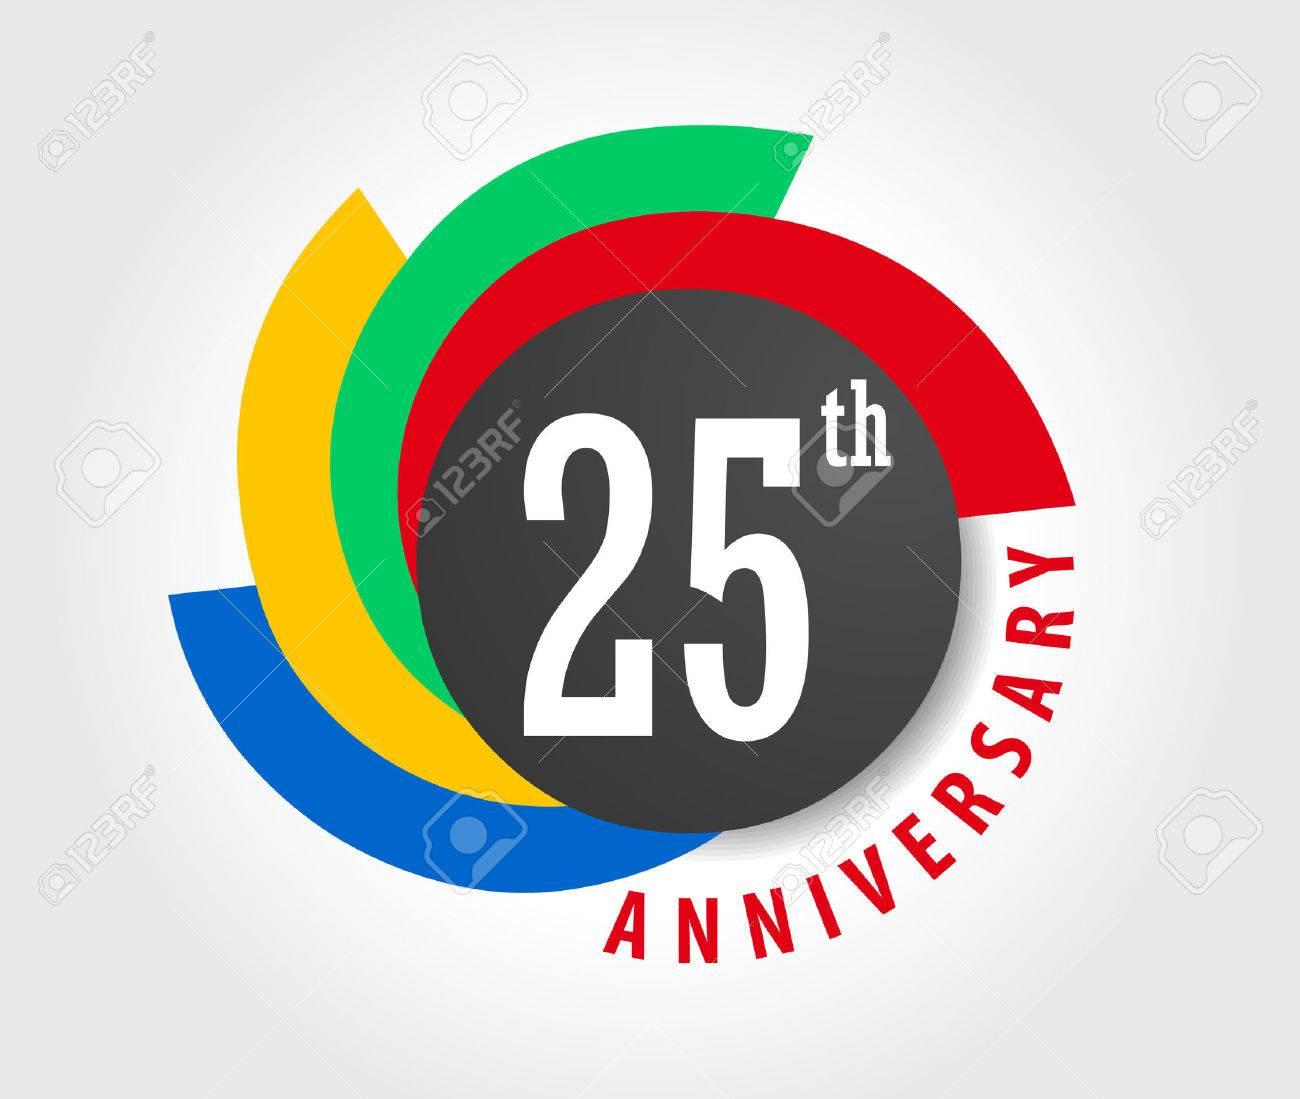 25th Anniversary celebration background, 25 years anniversary card illustration - 59936617